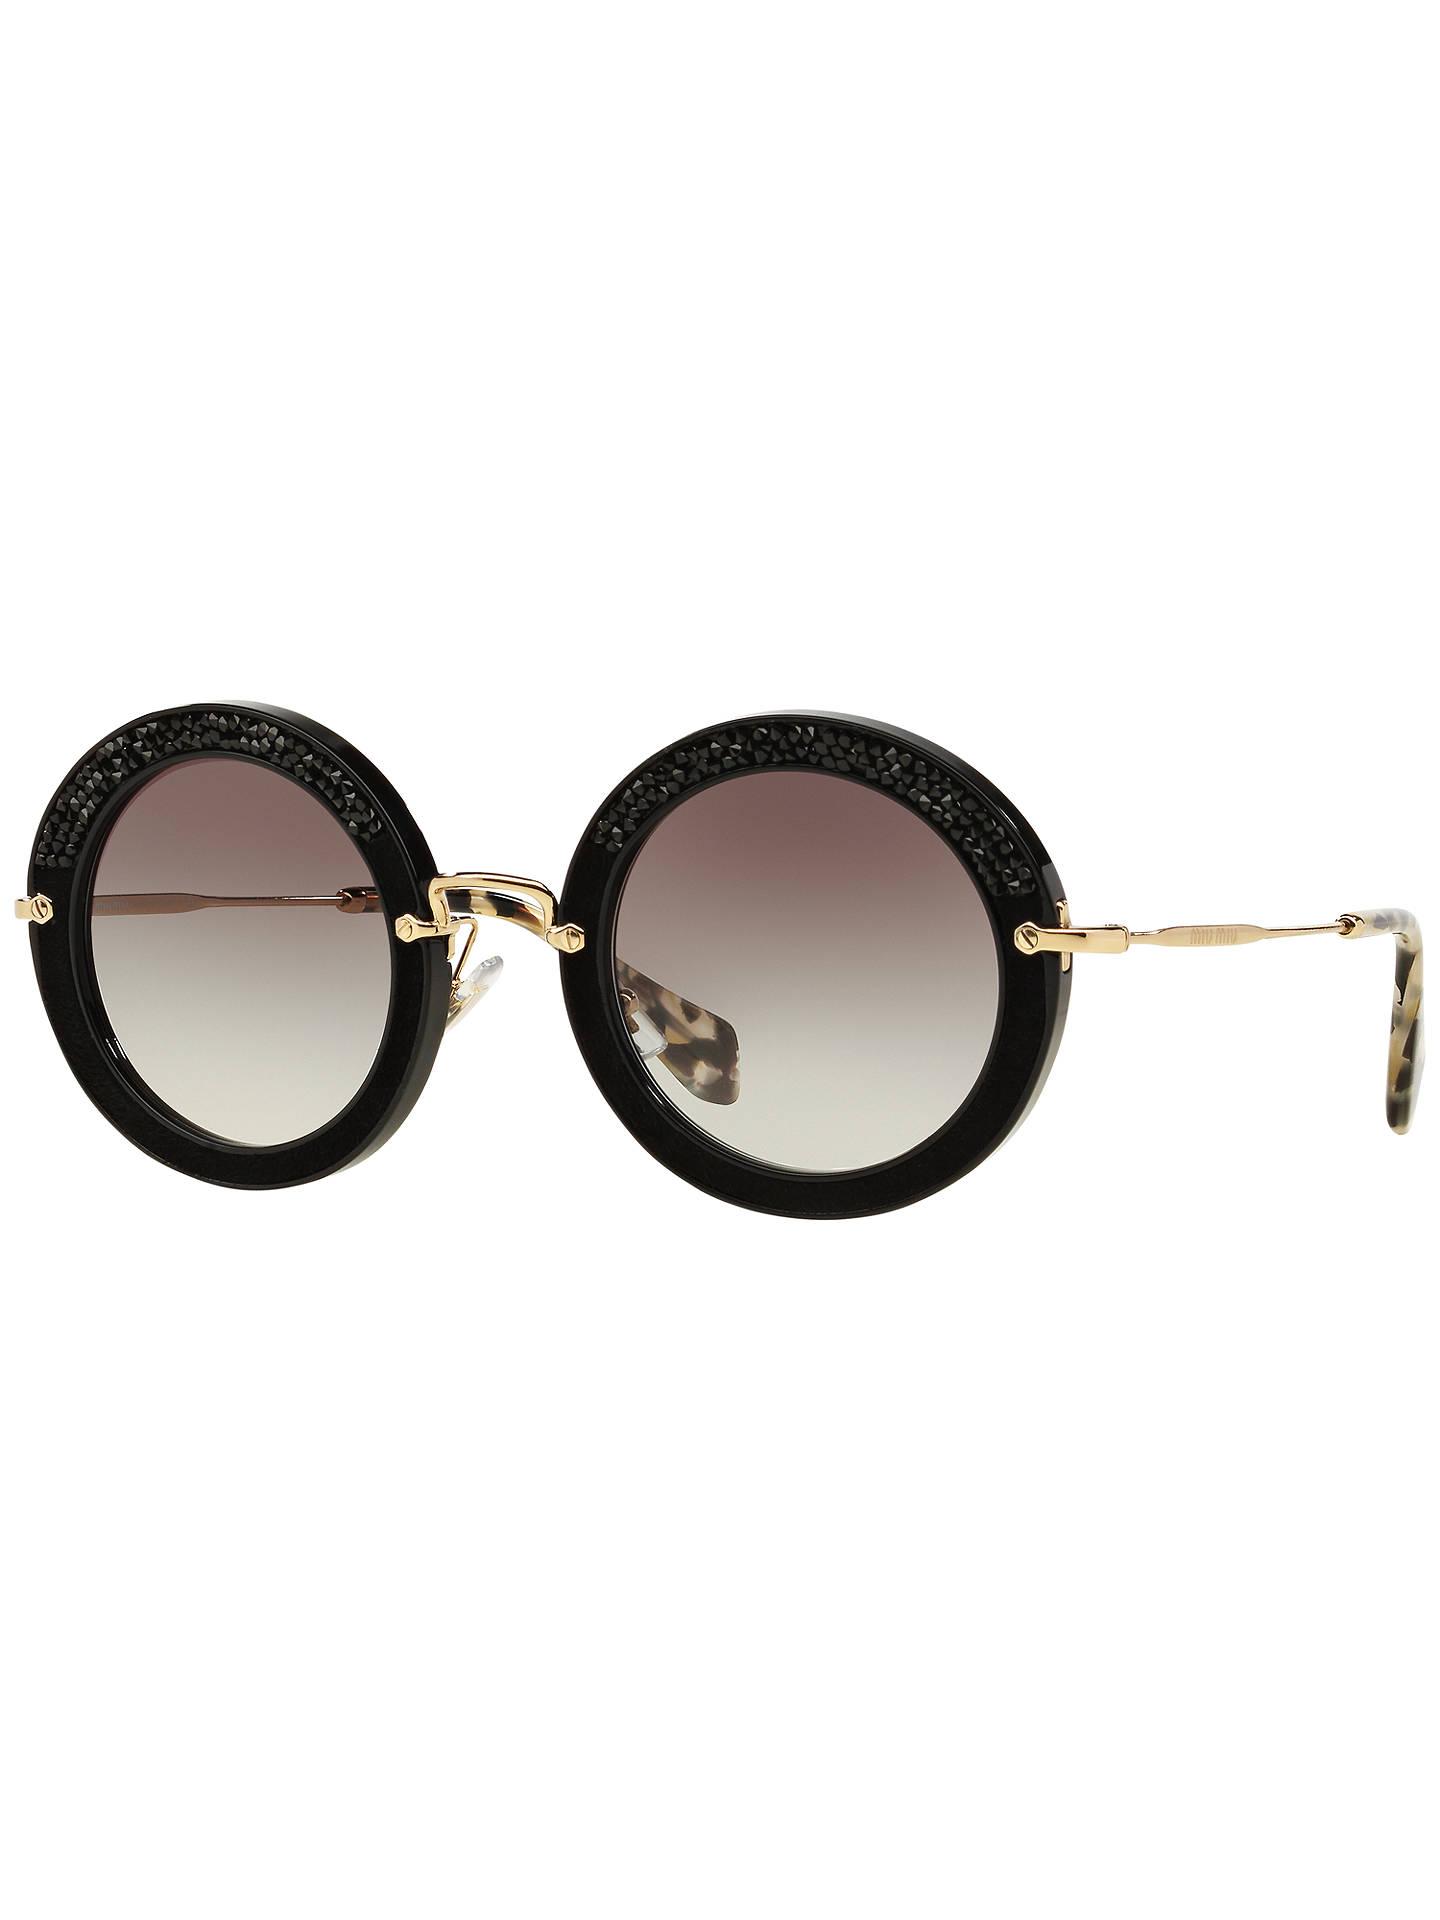 Miu Miu MU80RS Round Metal Frame Sunglasses at John Lewis & Partners